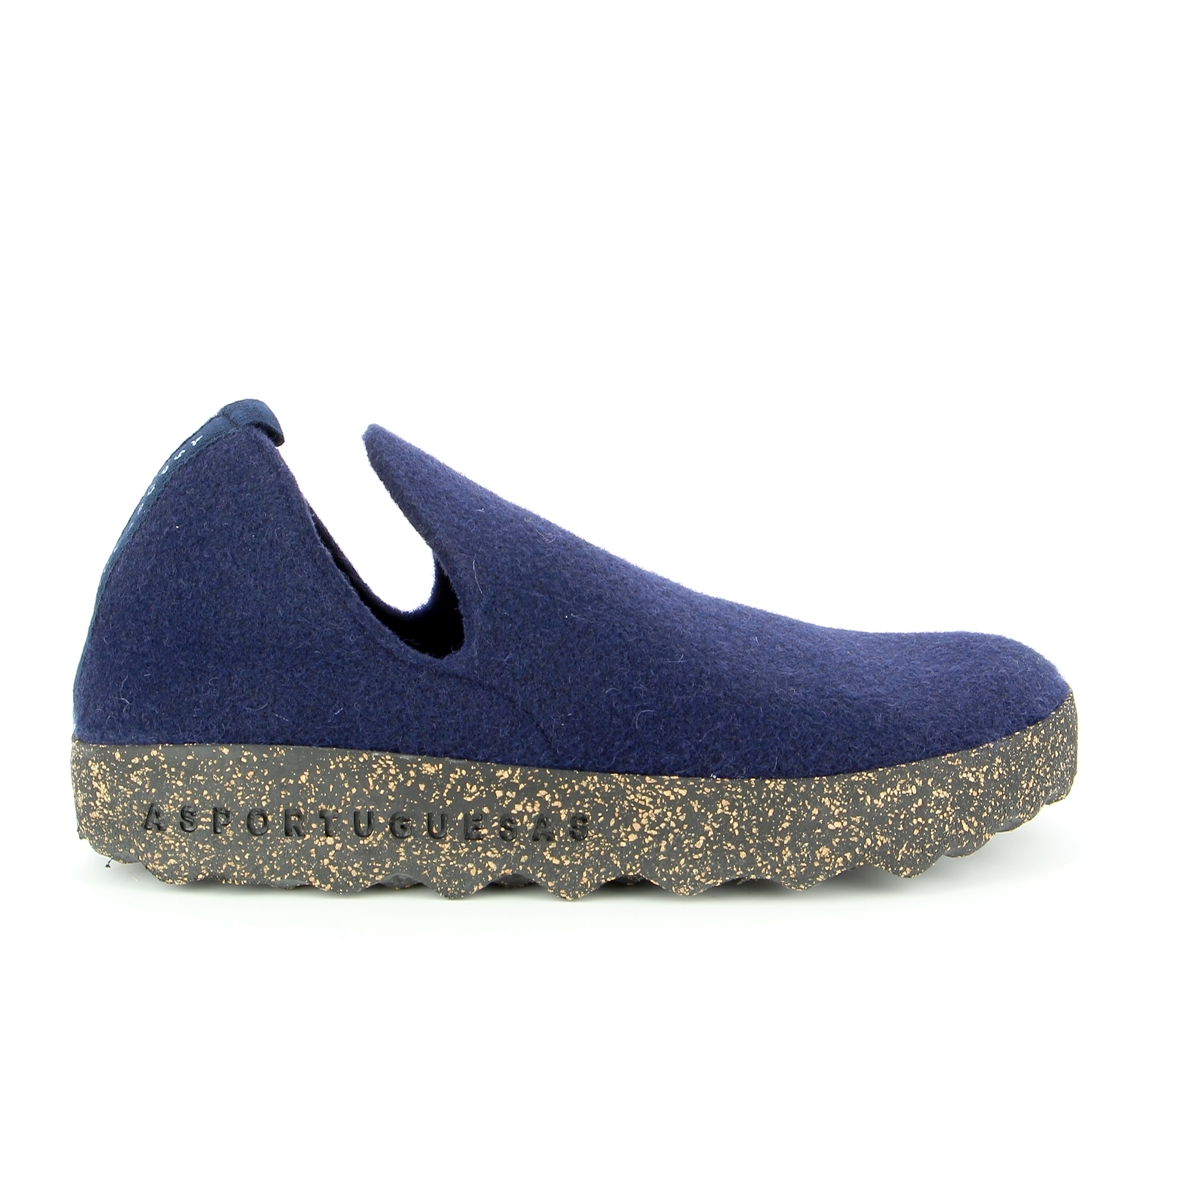 Asportuguesas Pantoffels blauw